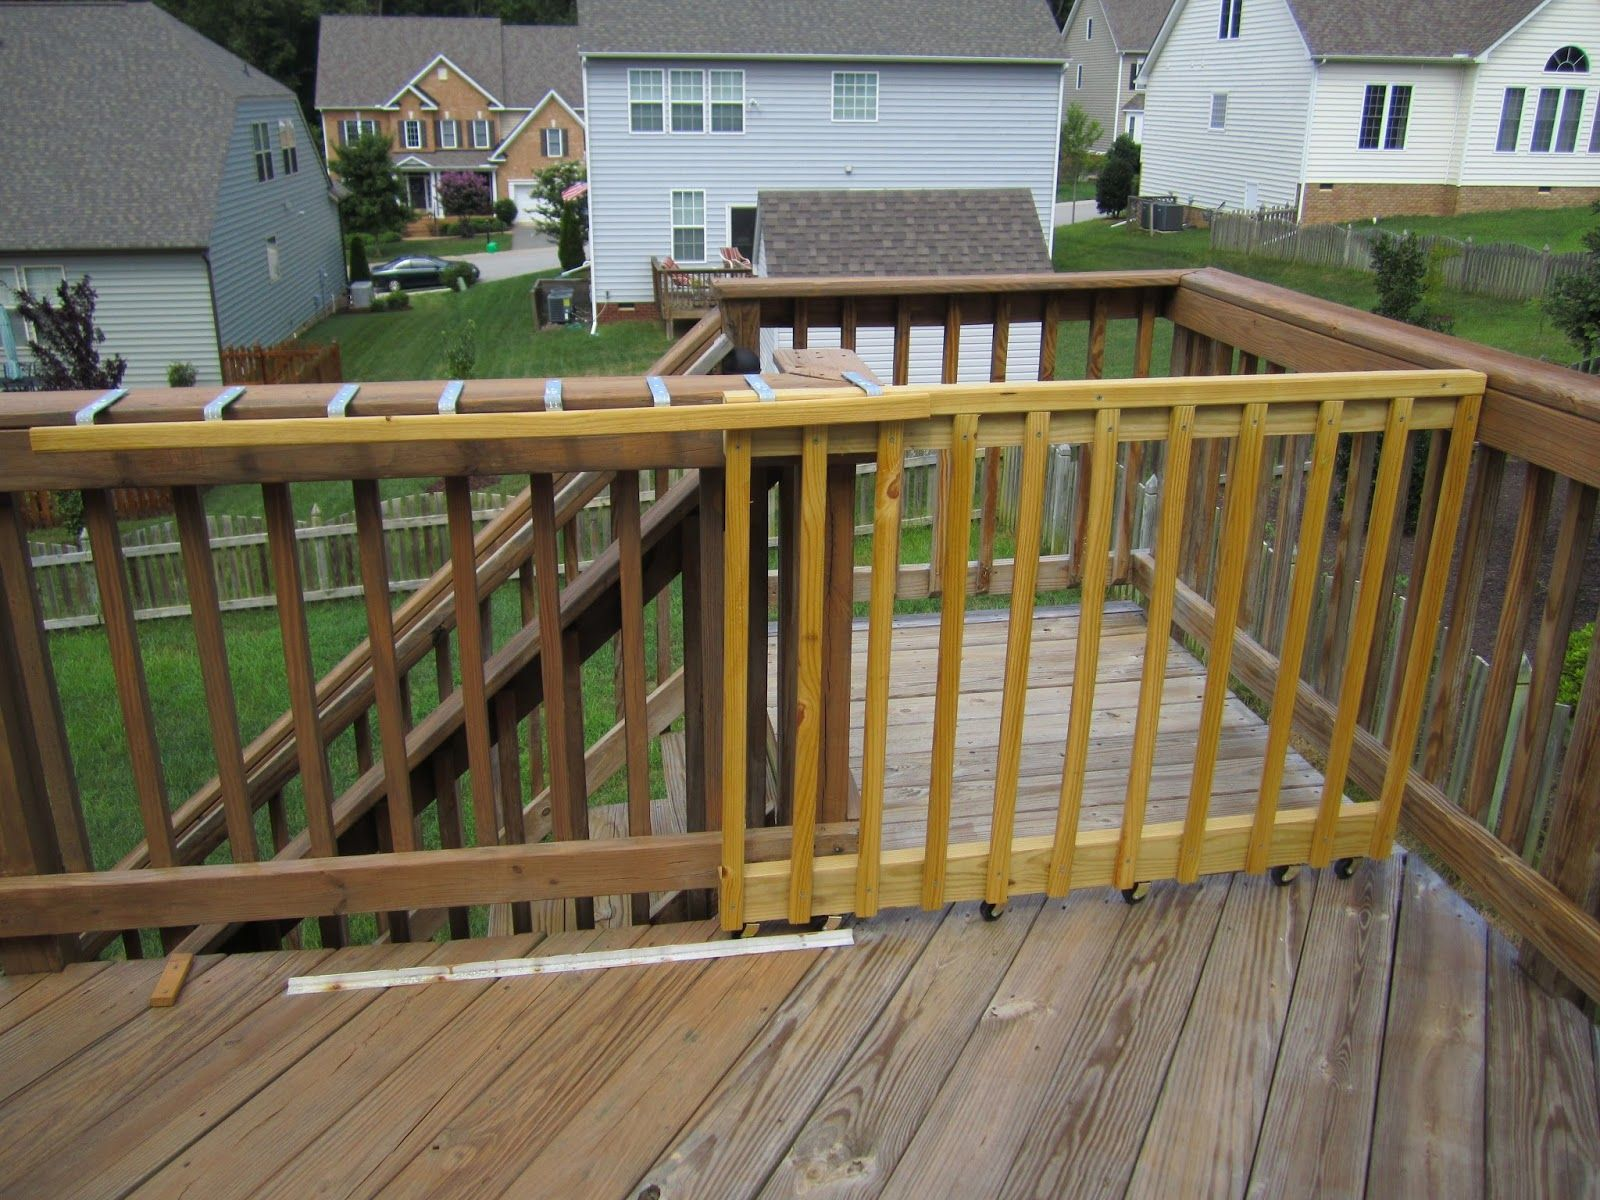 Diy A Sliding Gate For My Deck Deck Gate Sliding Gate Deck